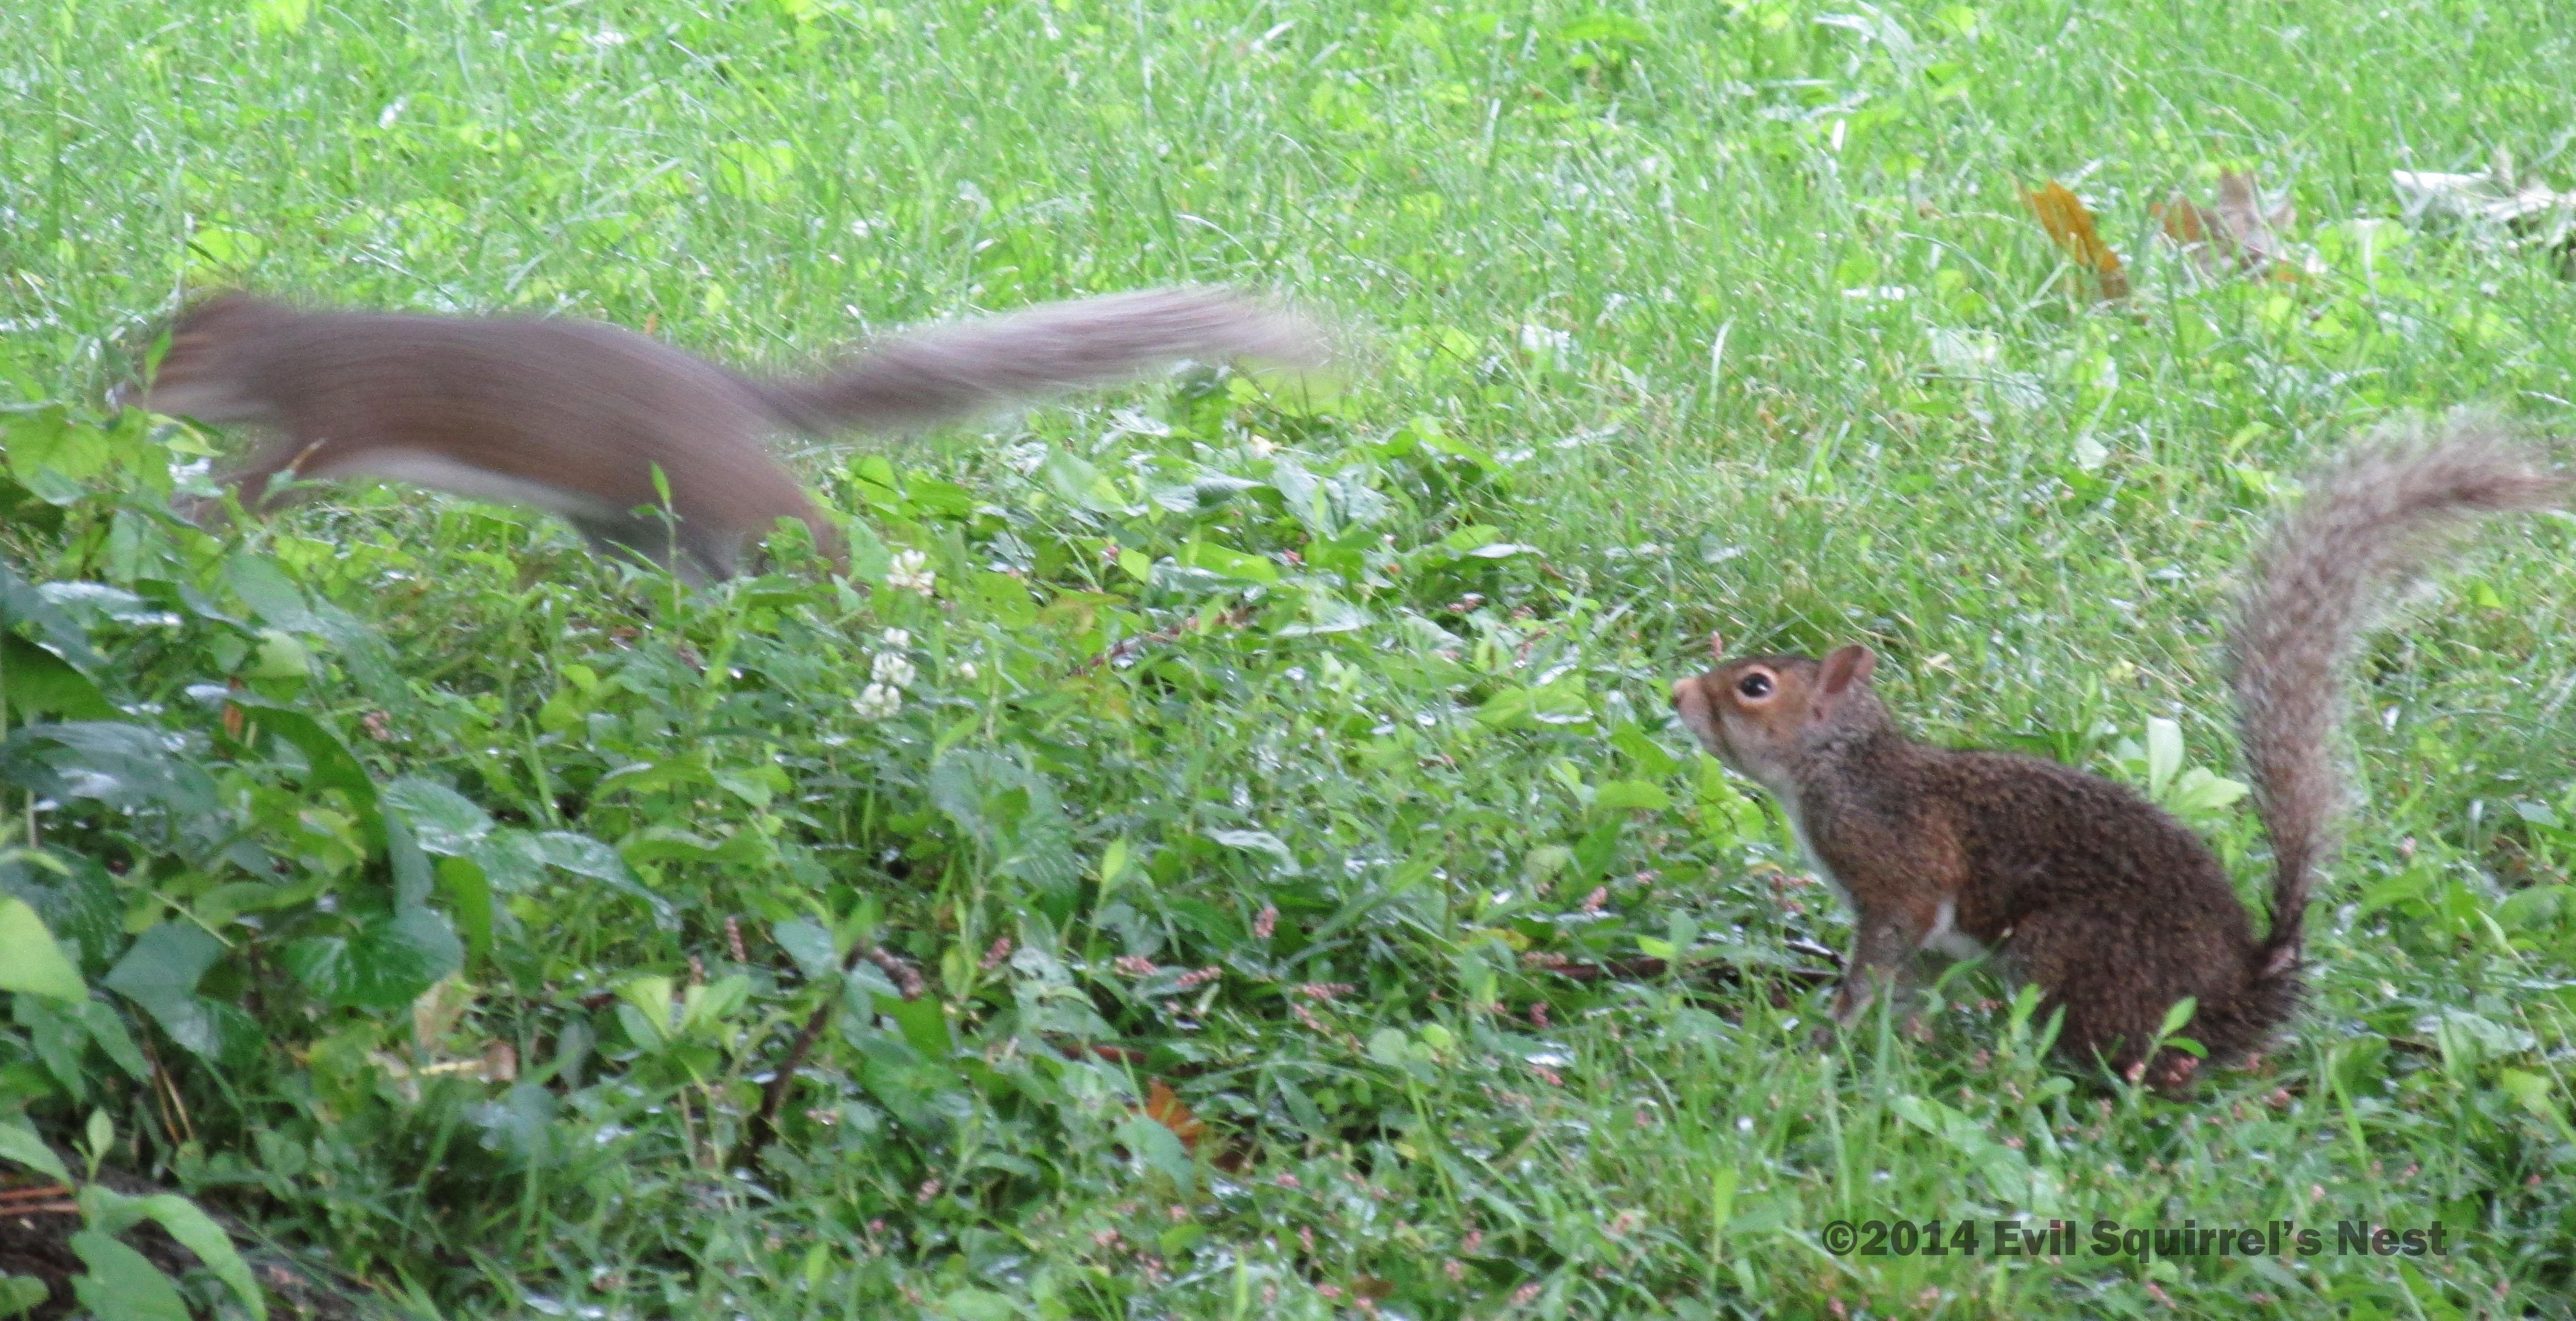 Nutty Squirrel Porno to the squirrel i love   evil squirrel's nest